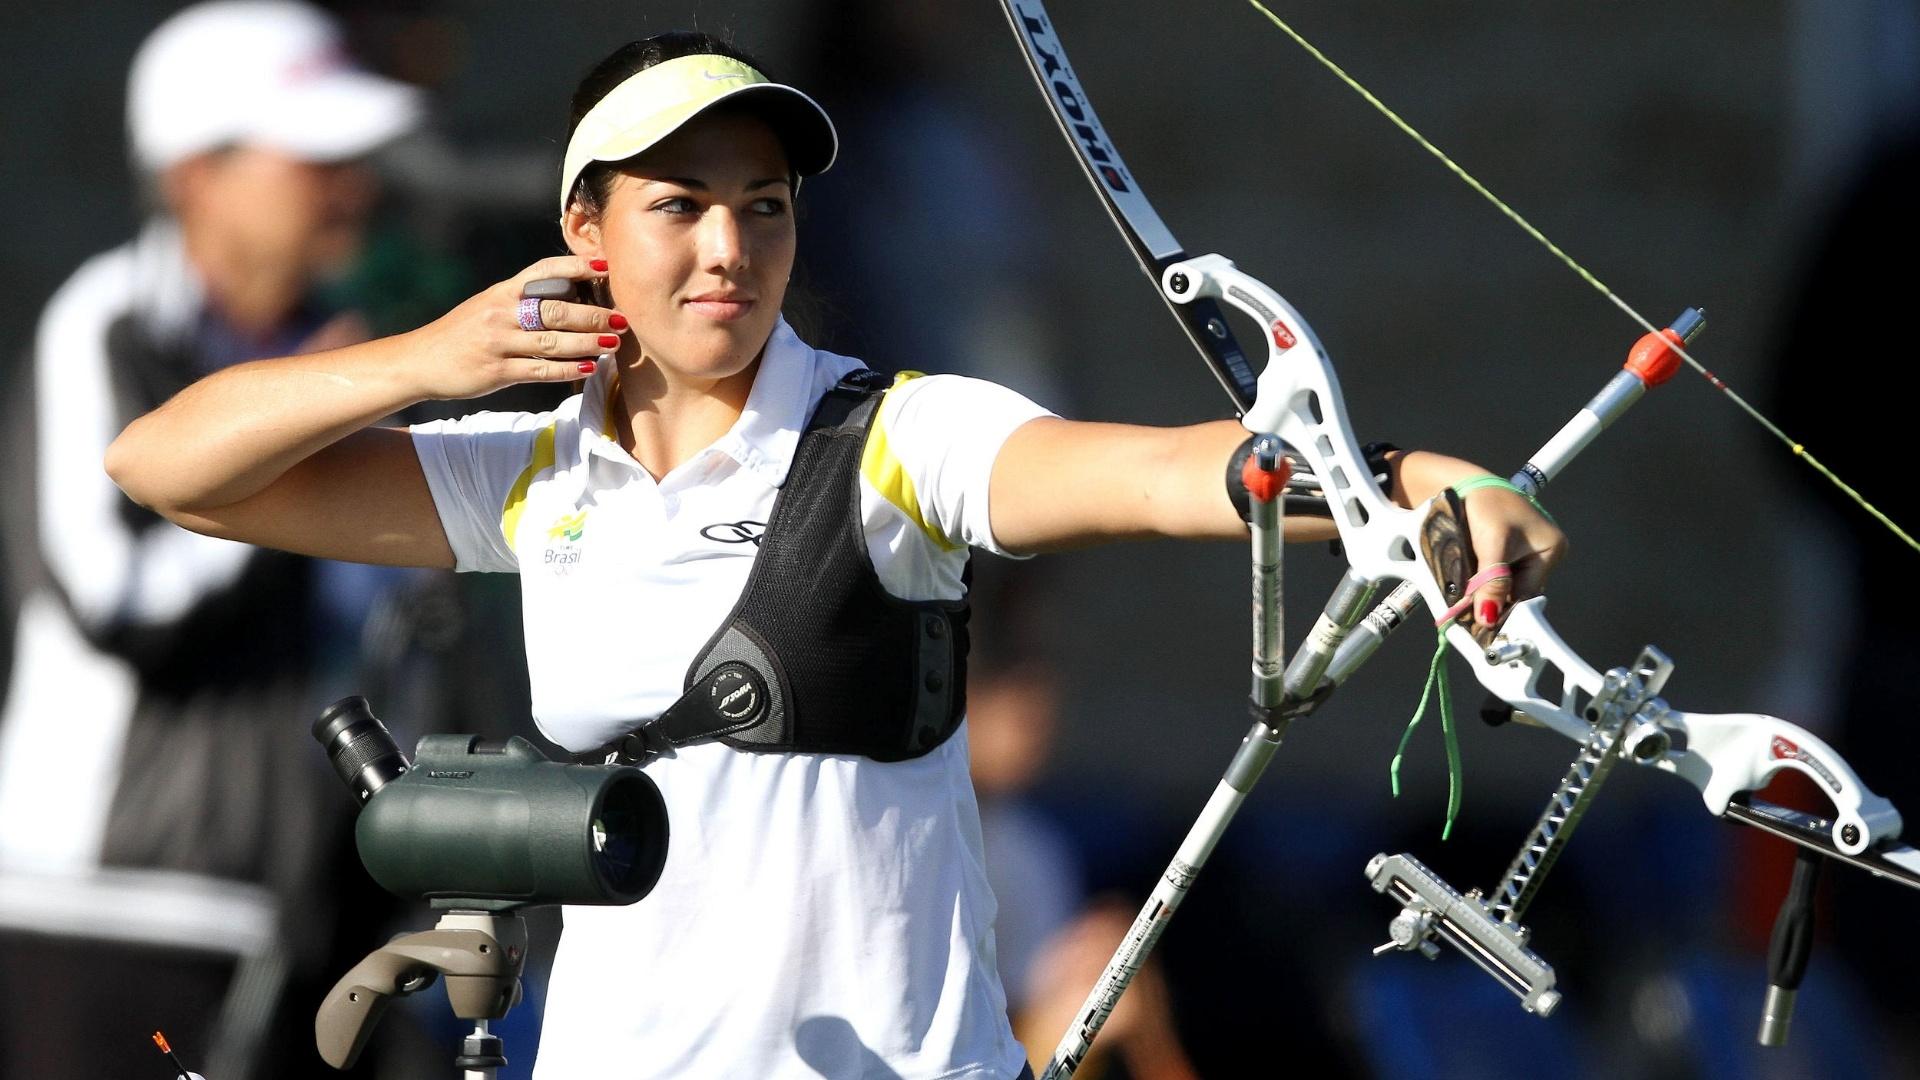 Michelle Aqcuesta mira o alvo no tiro com arco (19/10/2011)